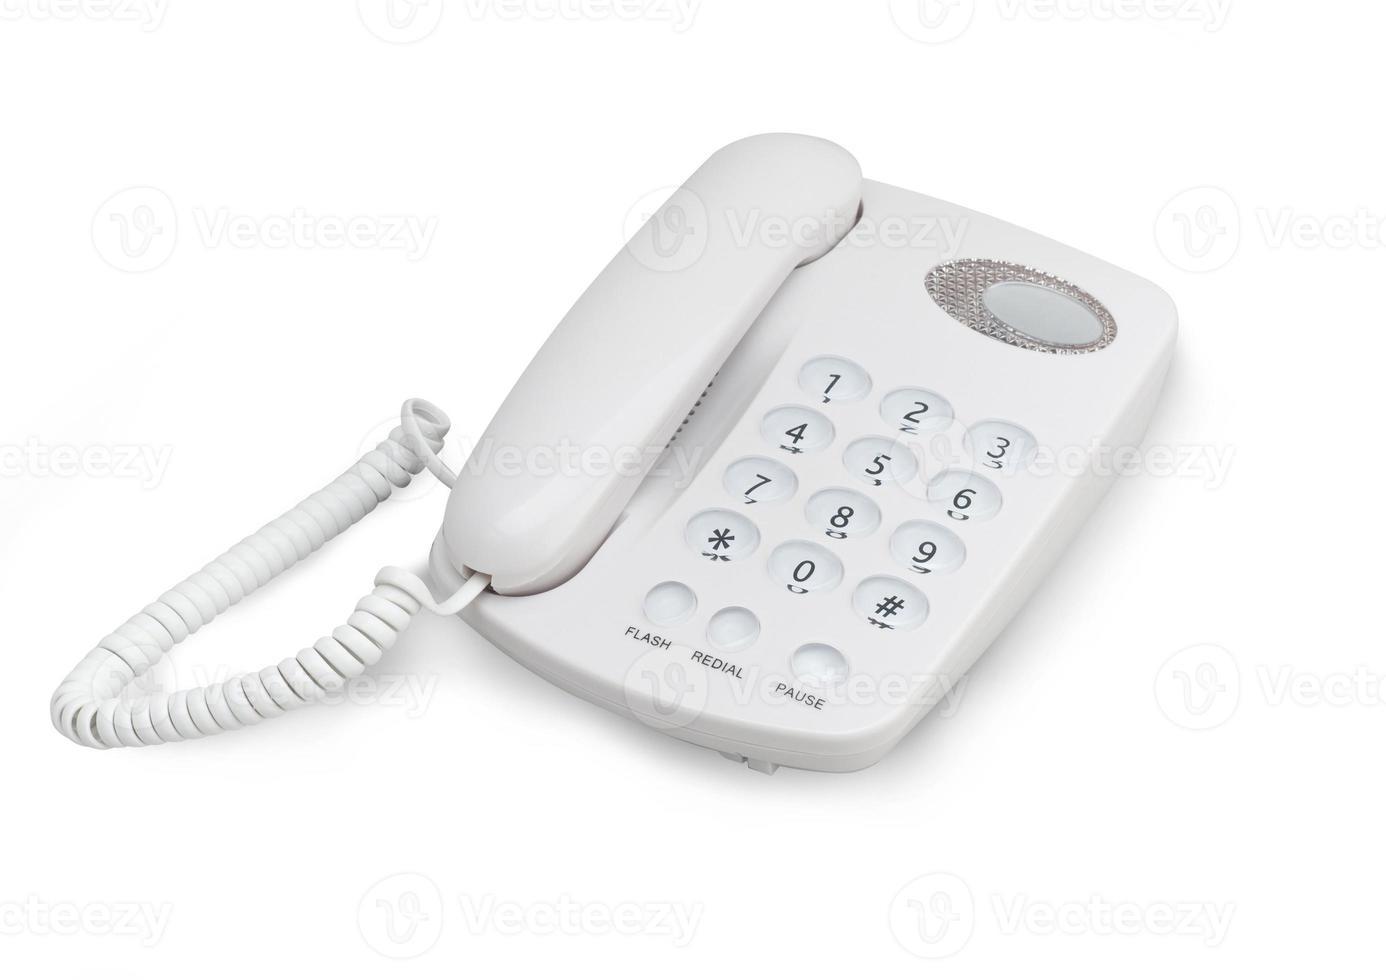 Téléphone photo